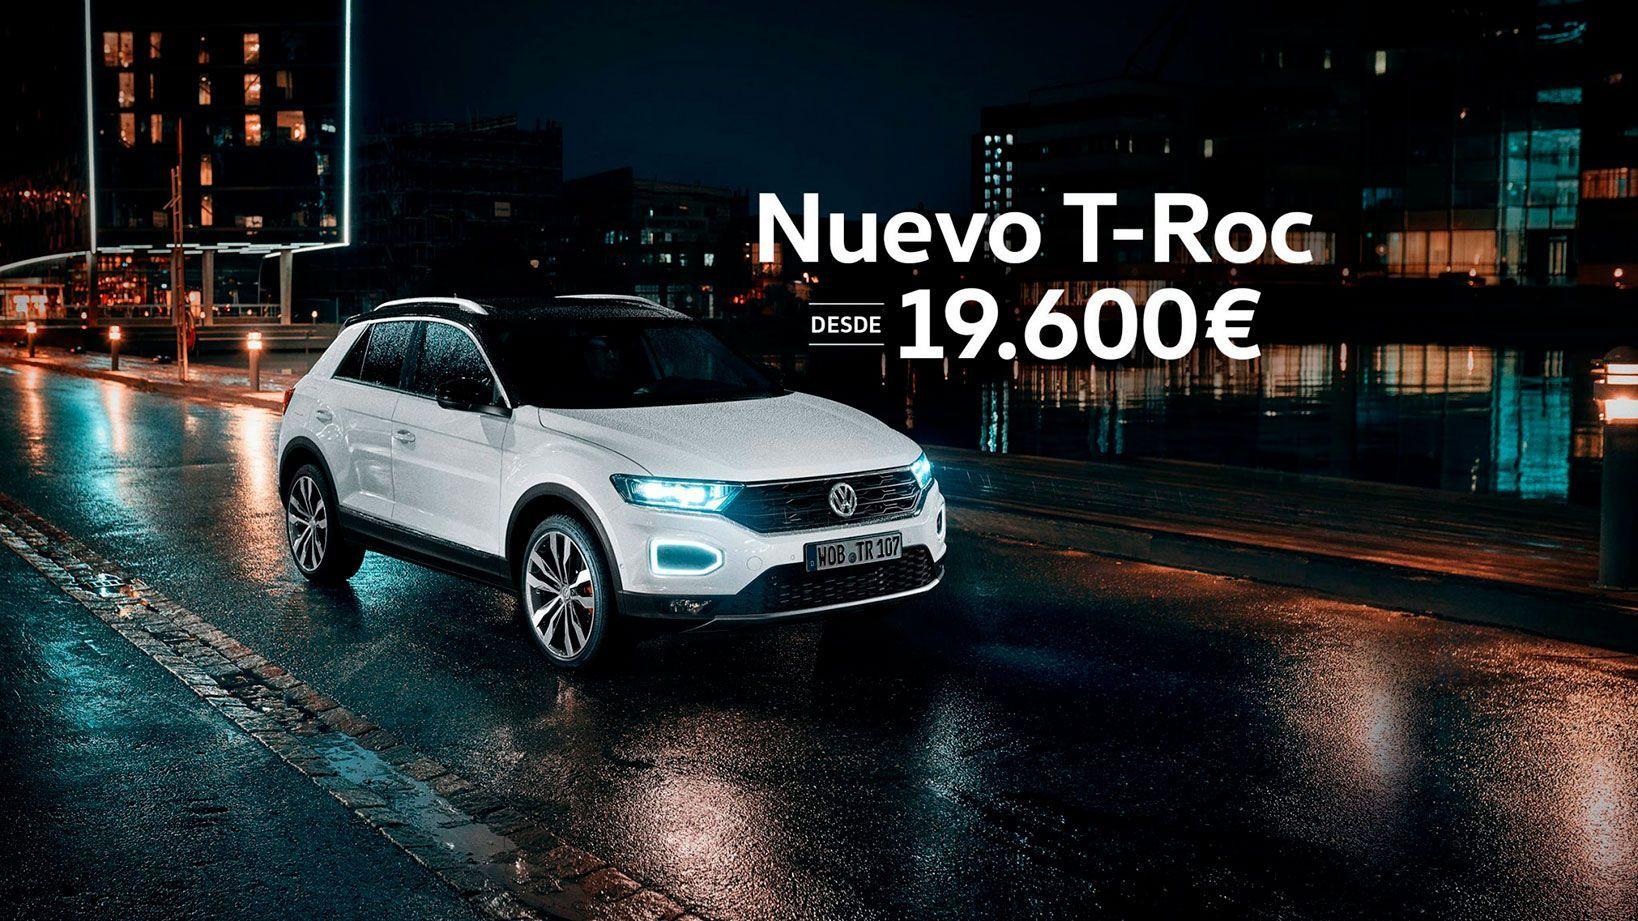 Nuevo T-Rioc